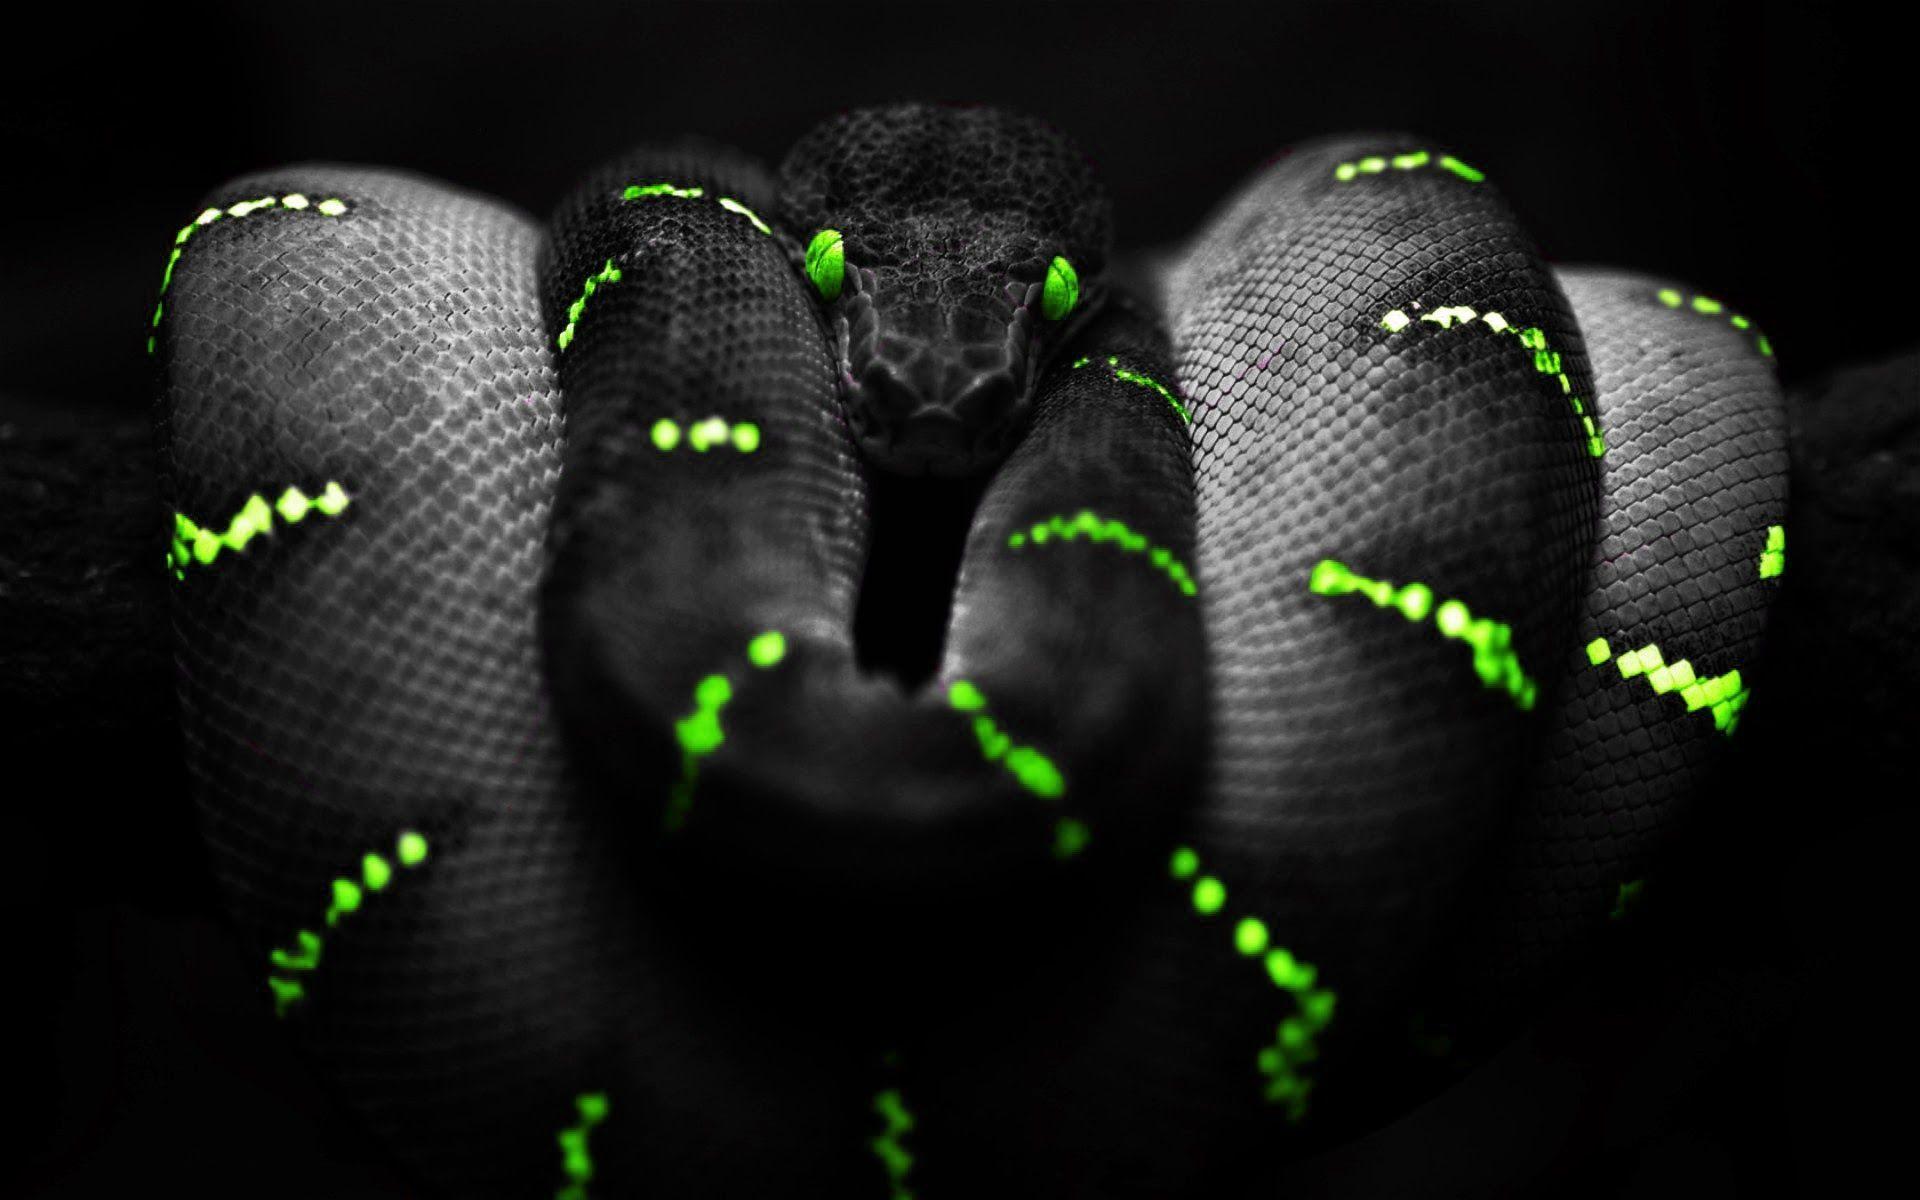 Pin By Tammy Underwood On Emam Snake Wallpaper Black Hd Wallpaper Snake